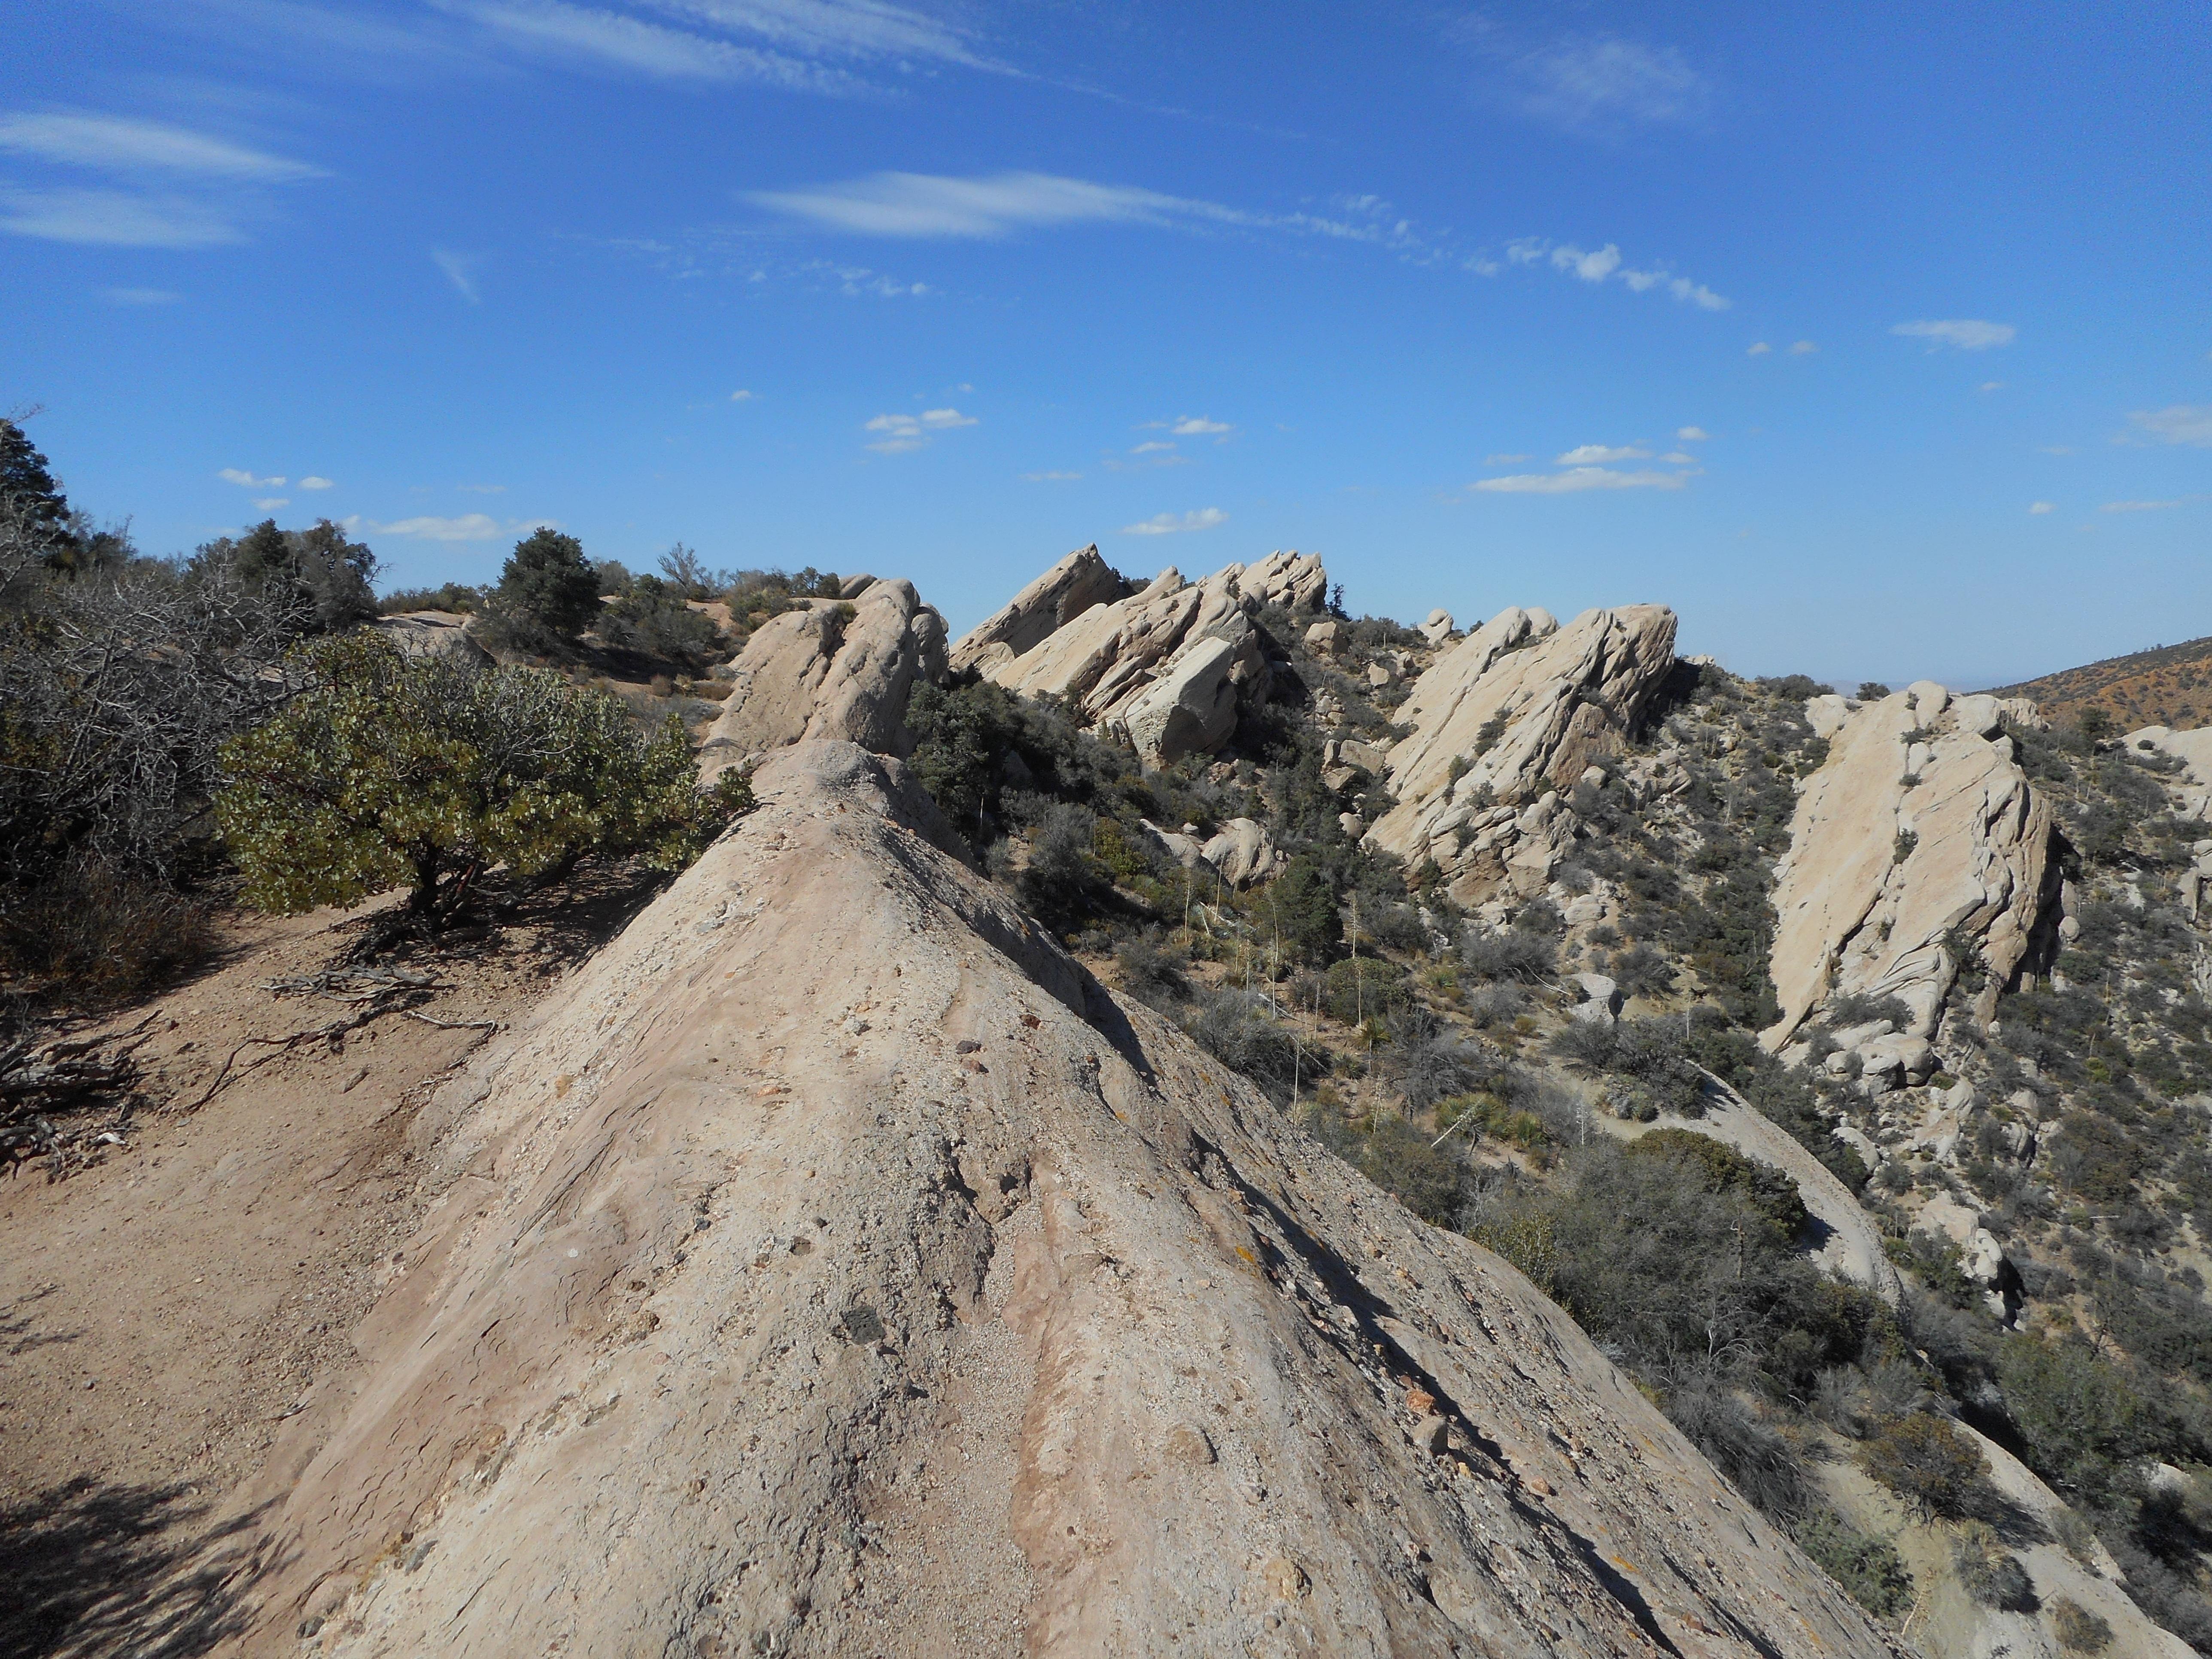 Mojave desert natural mojave